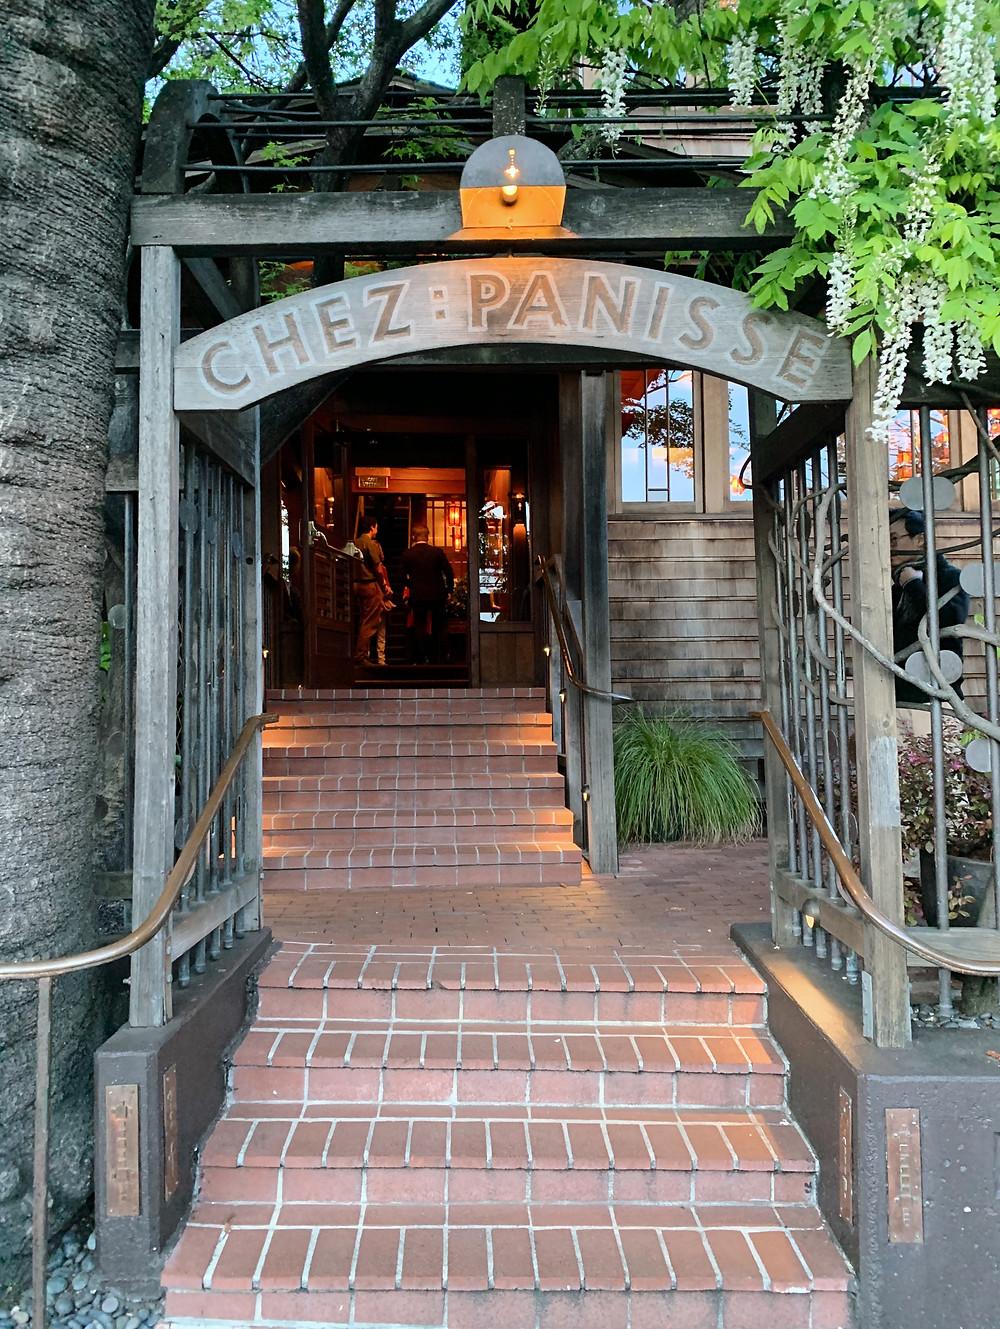 Chez Panisse restaurant in Berkeley, California